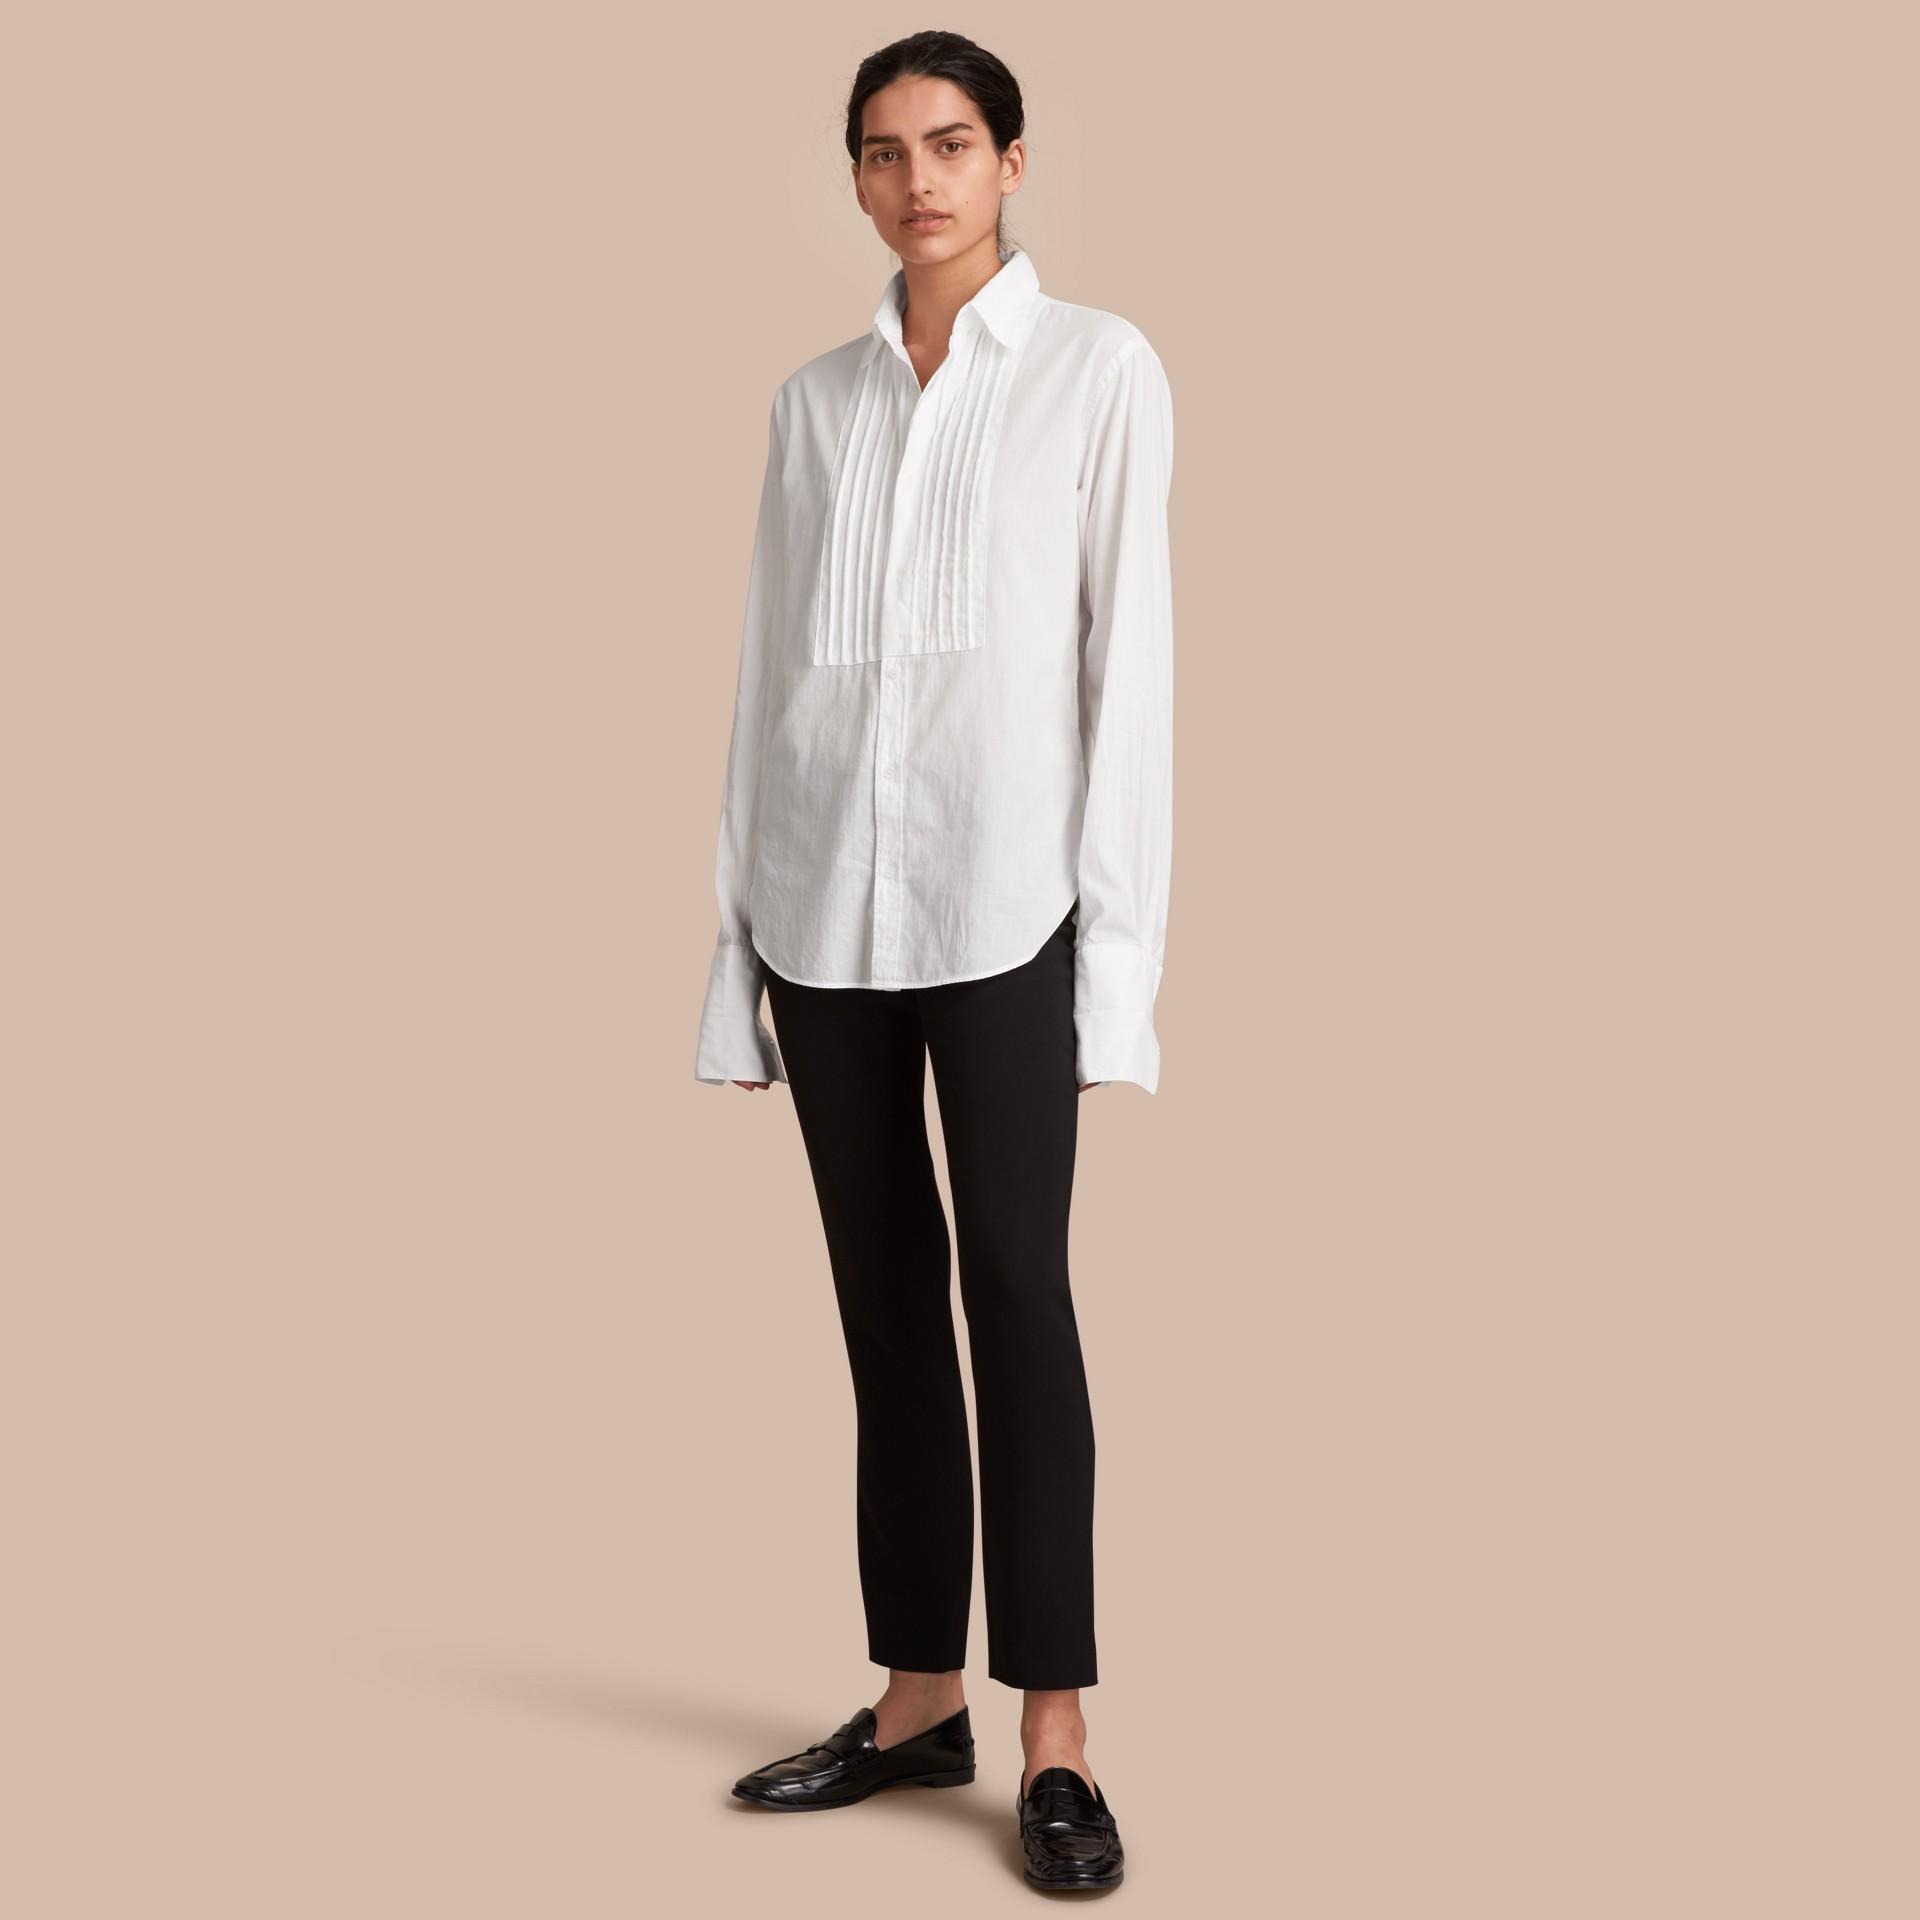 Unisex Double-cuff Pintuck Bib Cotton Shirt White - gallery image 1